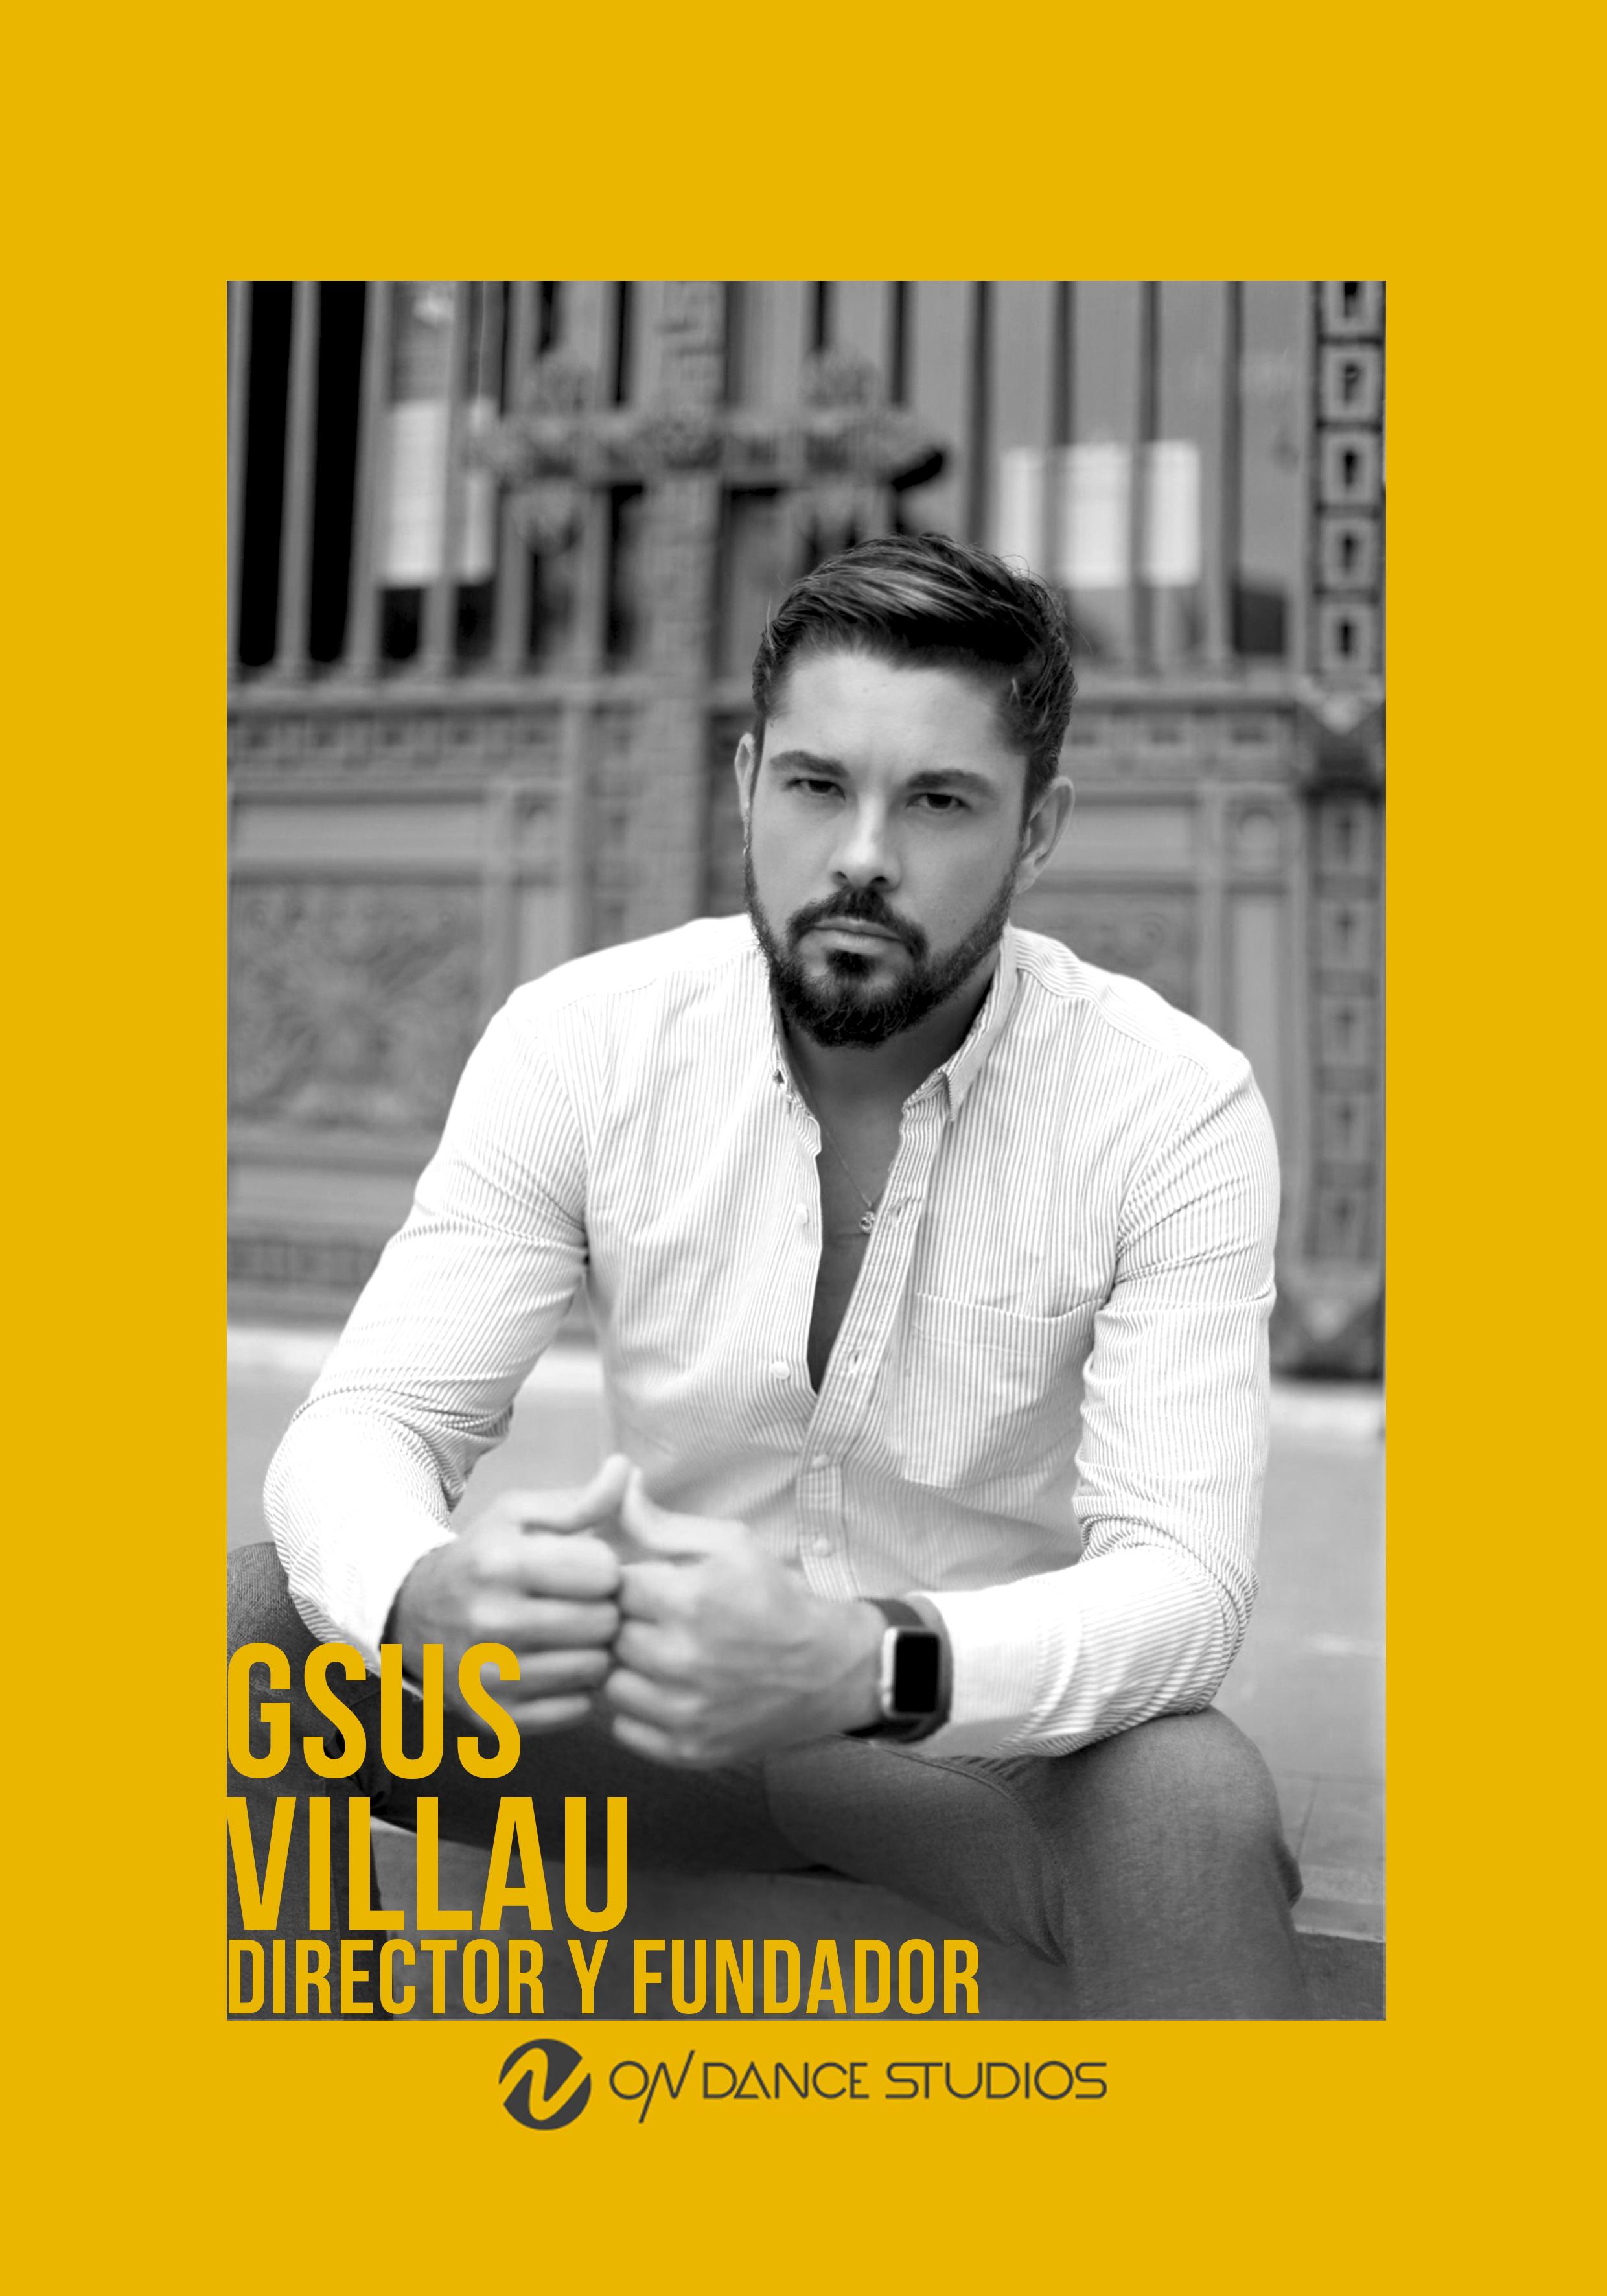 Gsus Villau